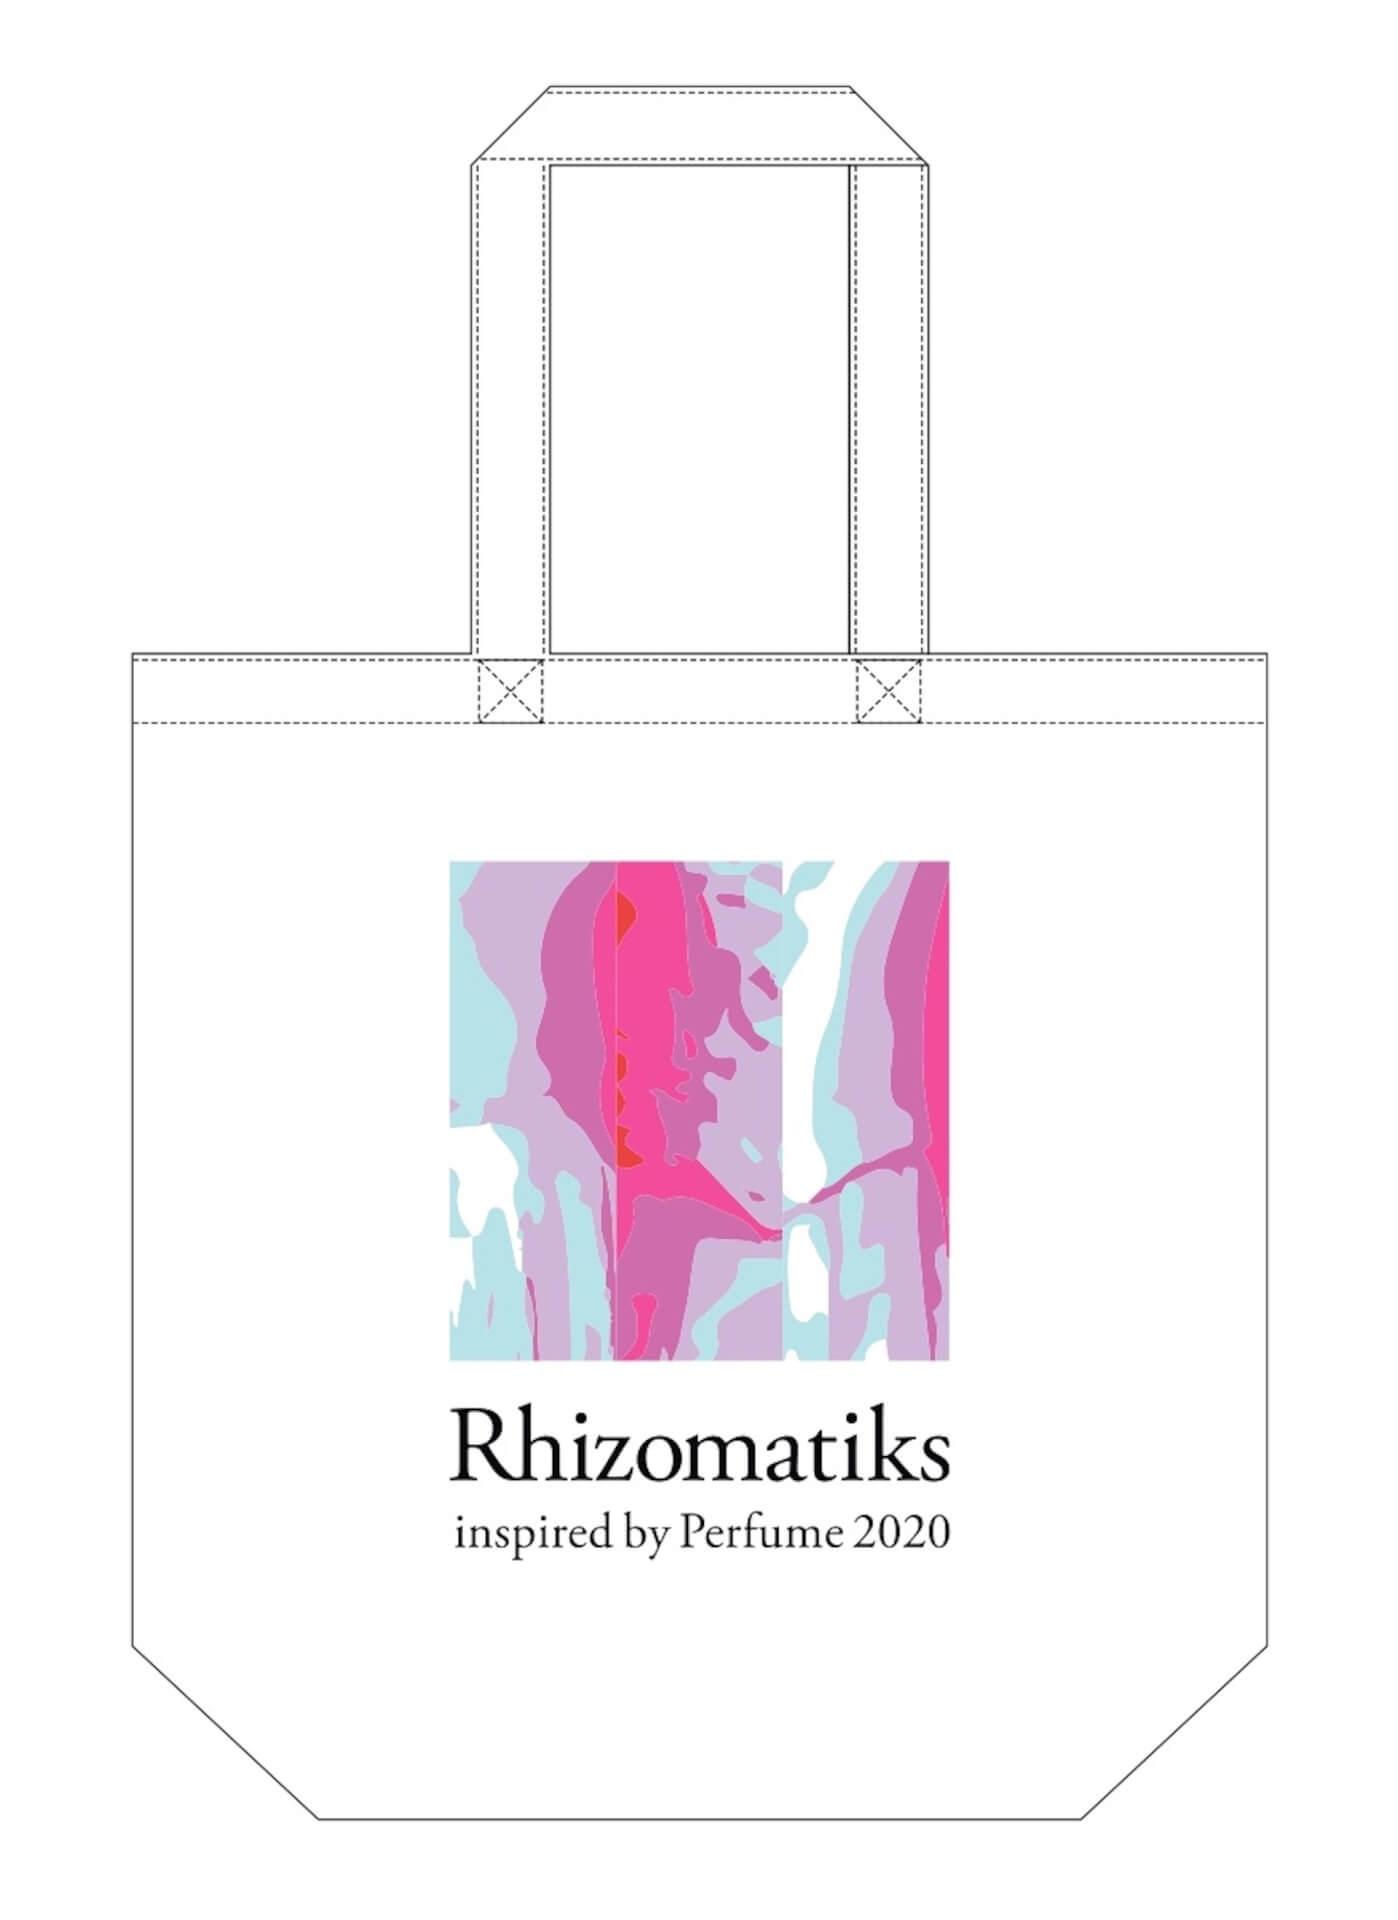 Perfume舞台演出の裏側を体験!<Rhizomatiks inspired by Perfume 2020>が渋谷PARCO MUSEUMで開催! ac200109_rhizomatiksparco_03